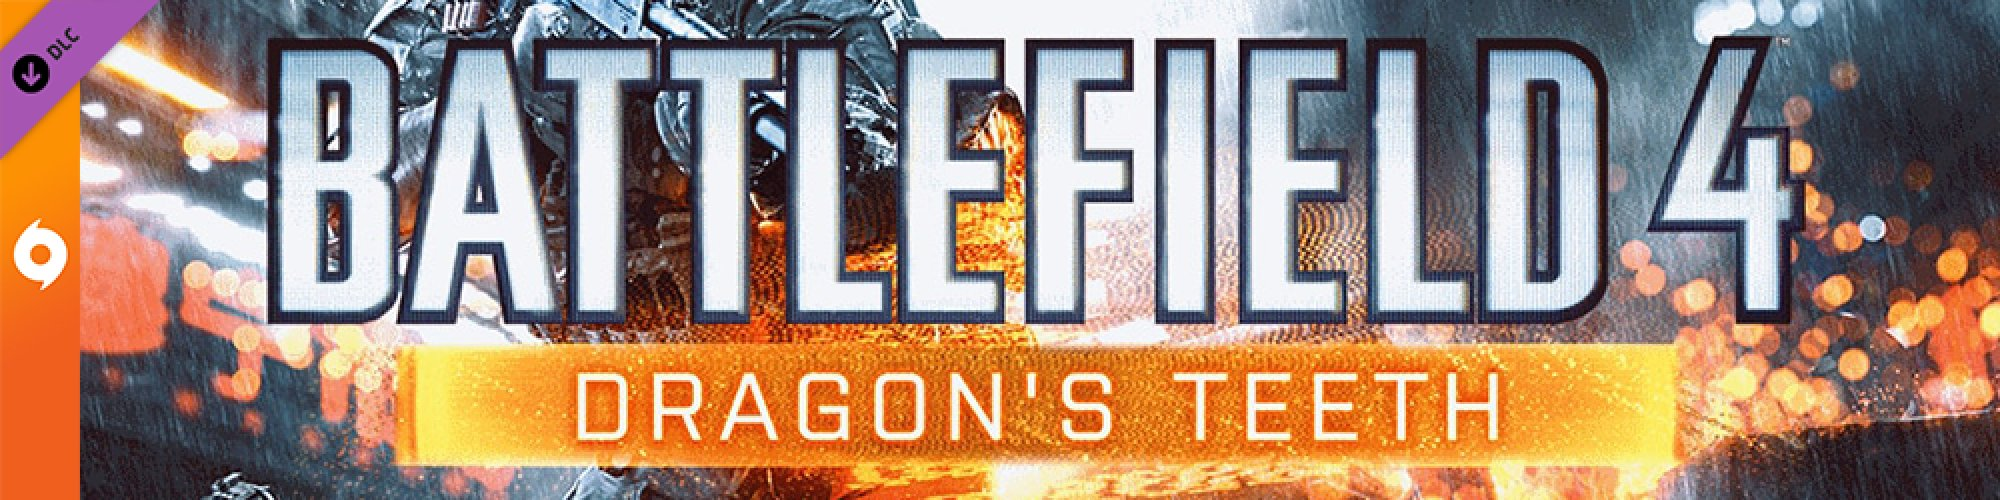 Battlefield 4 Dragons Teeth banner